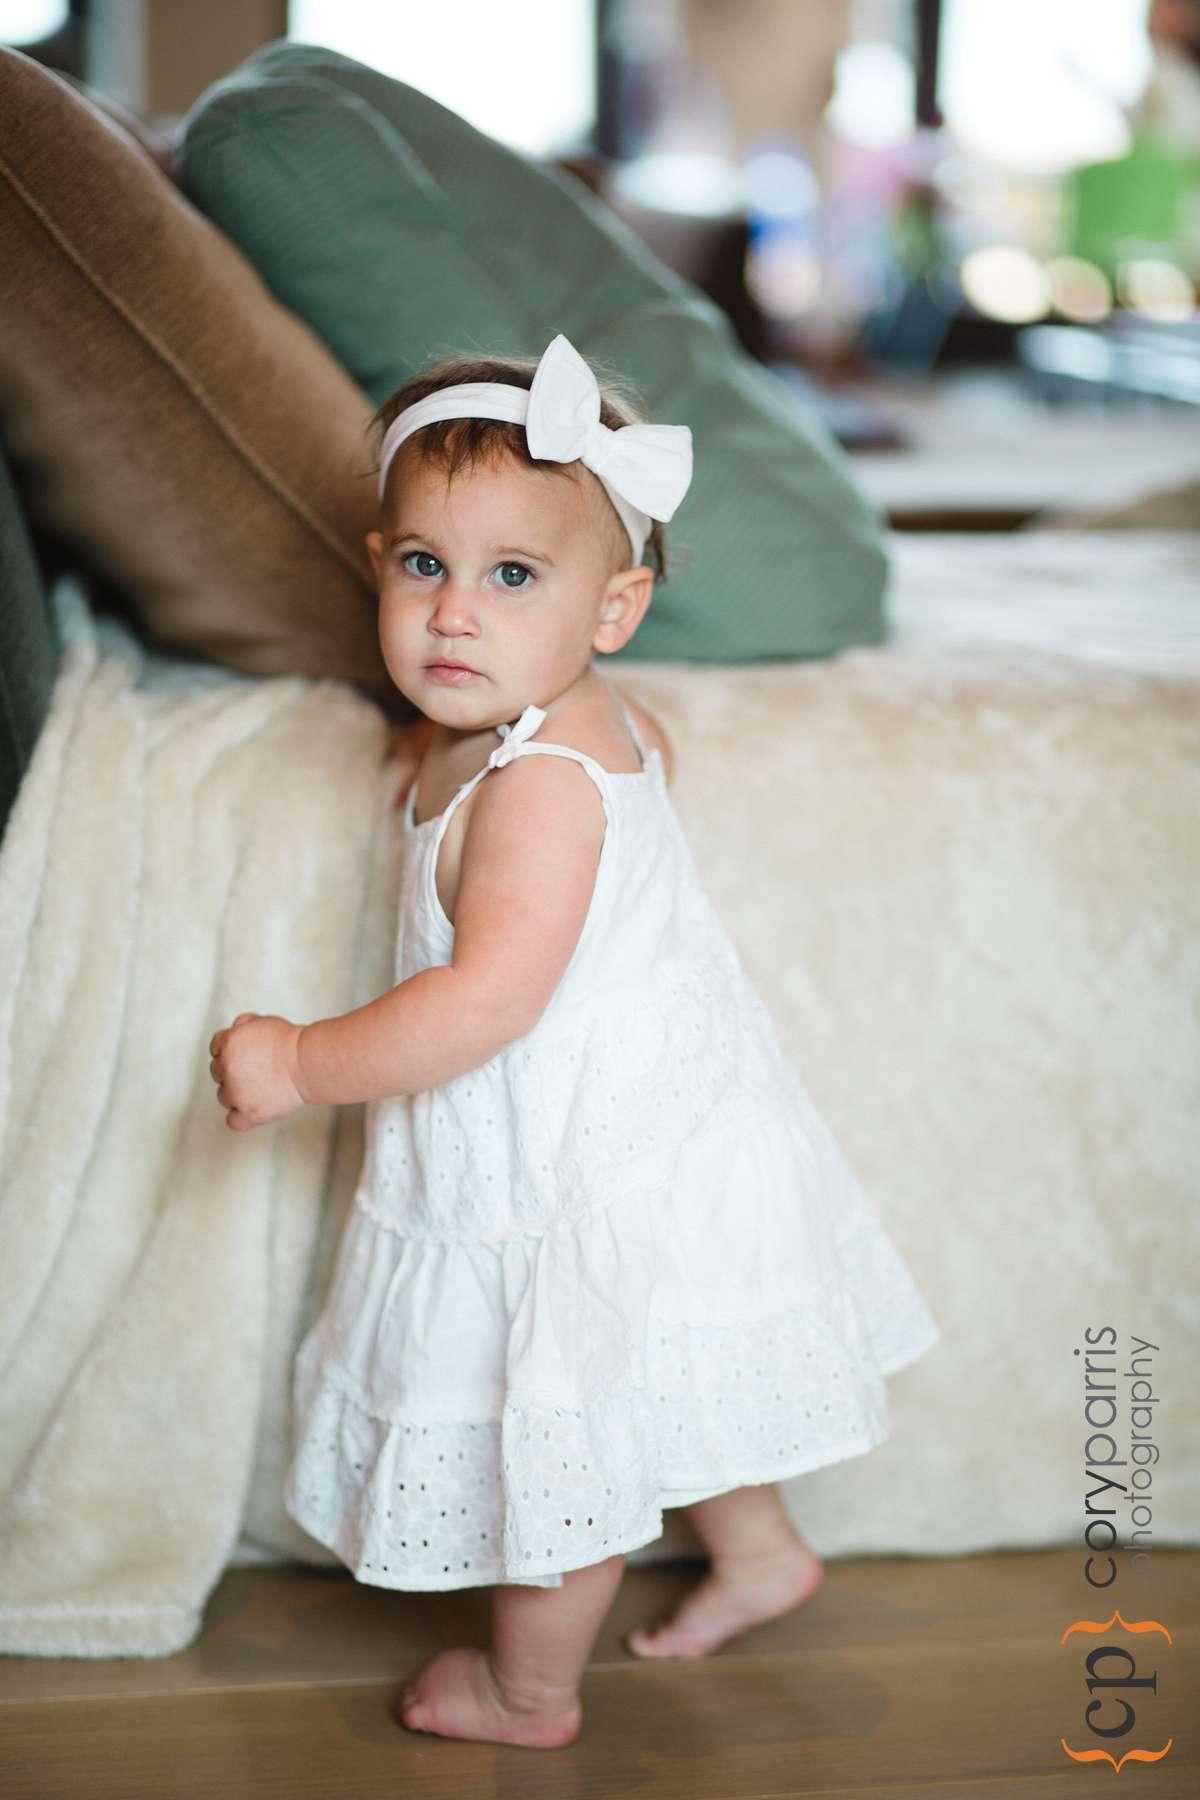 Cute baby portrait.